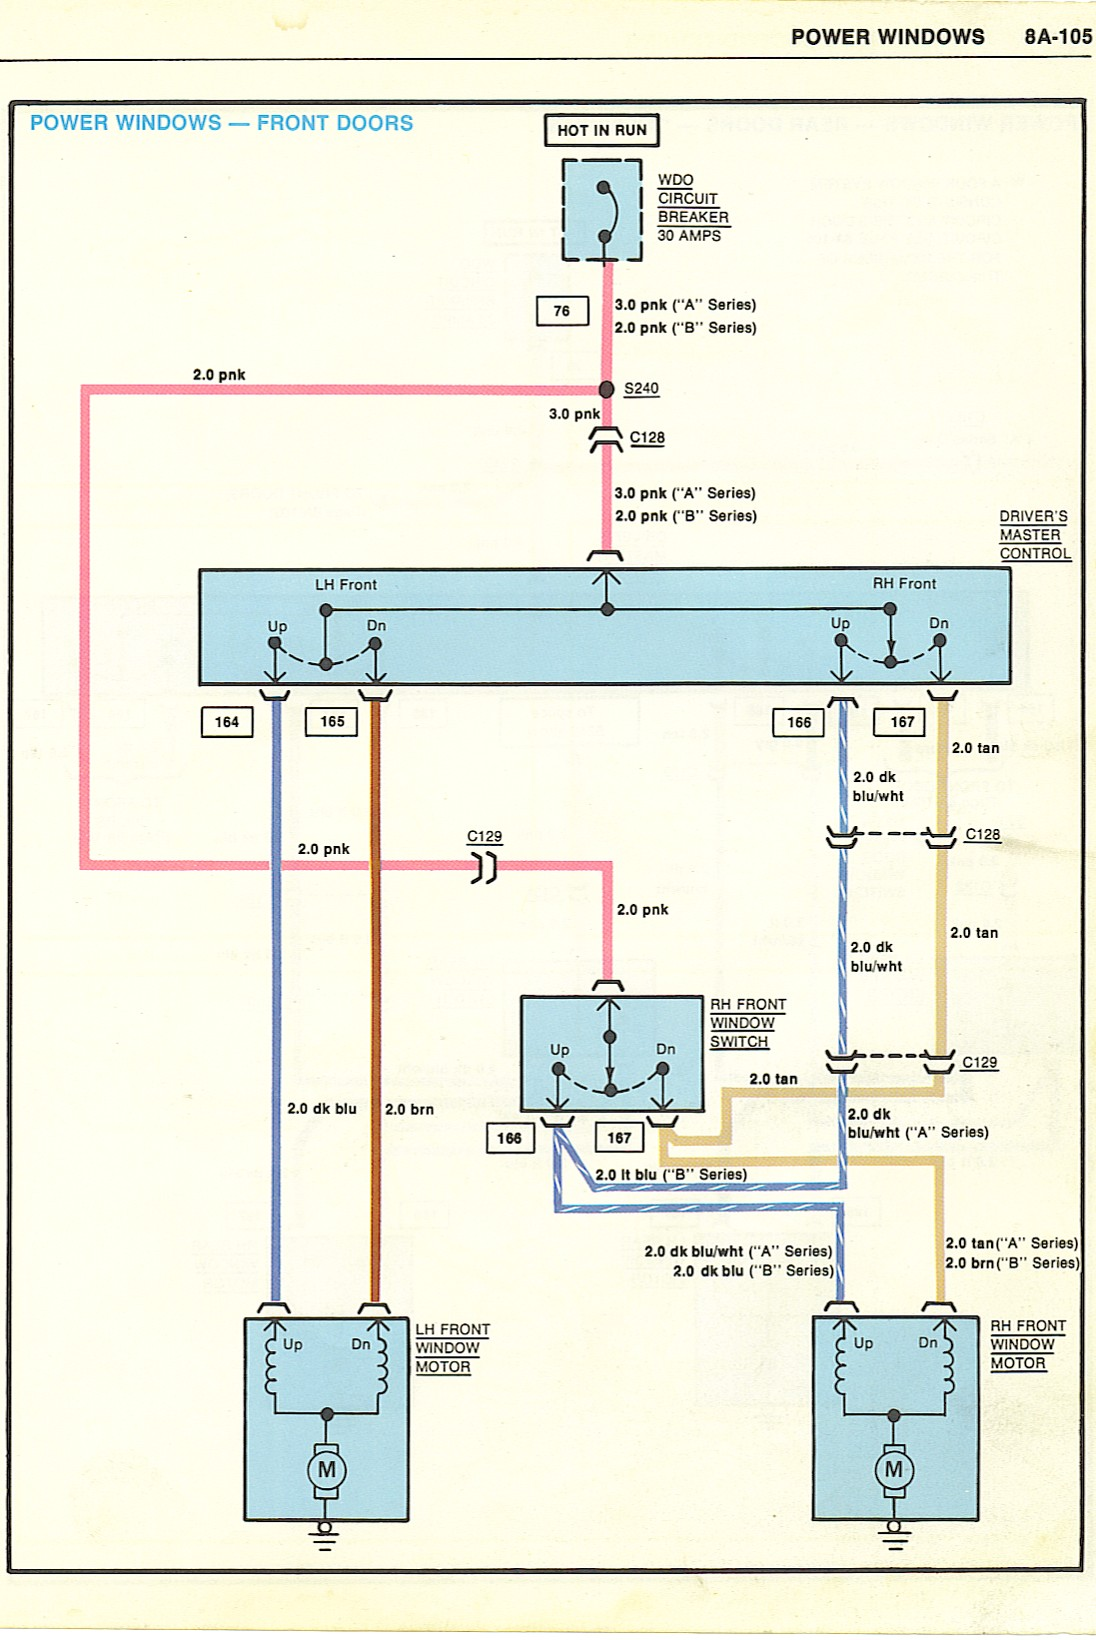 1988 chevy truck power window wiring